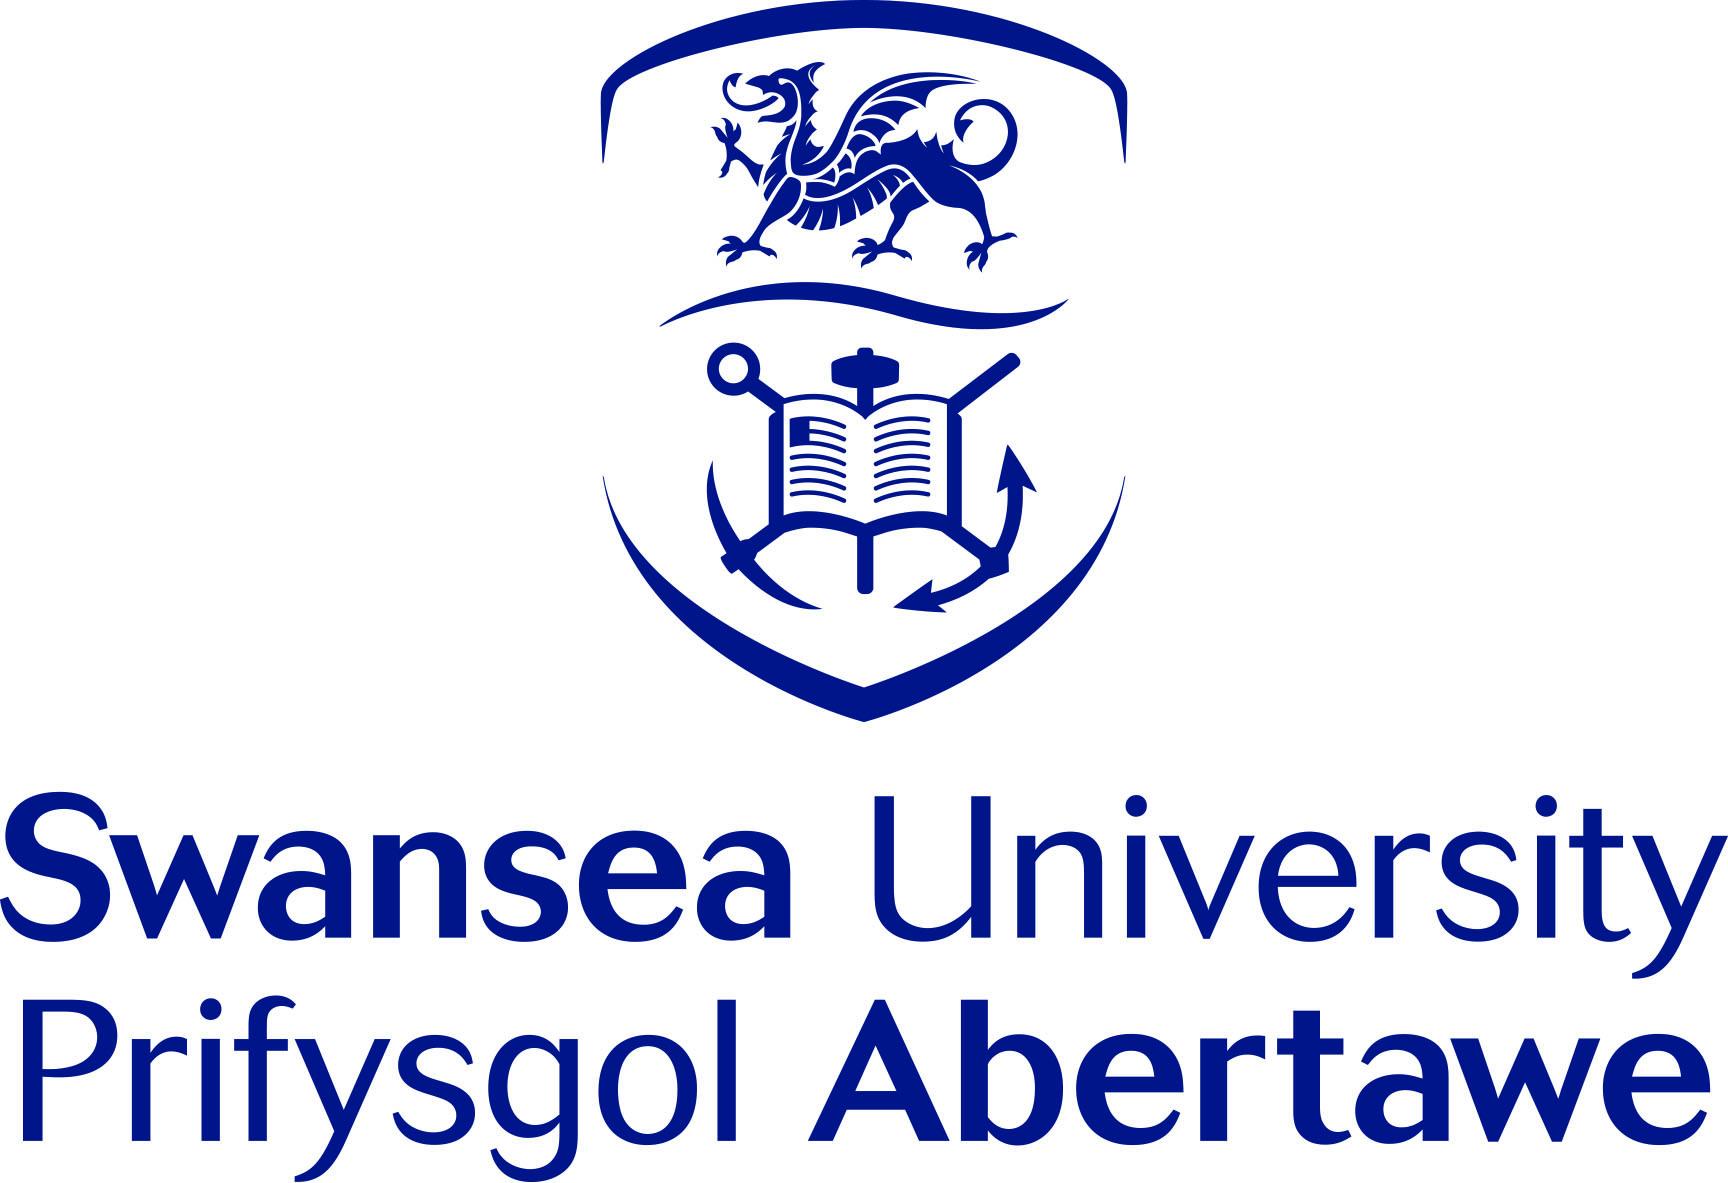 Swansea University crest logo